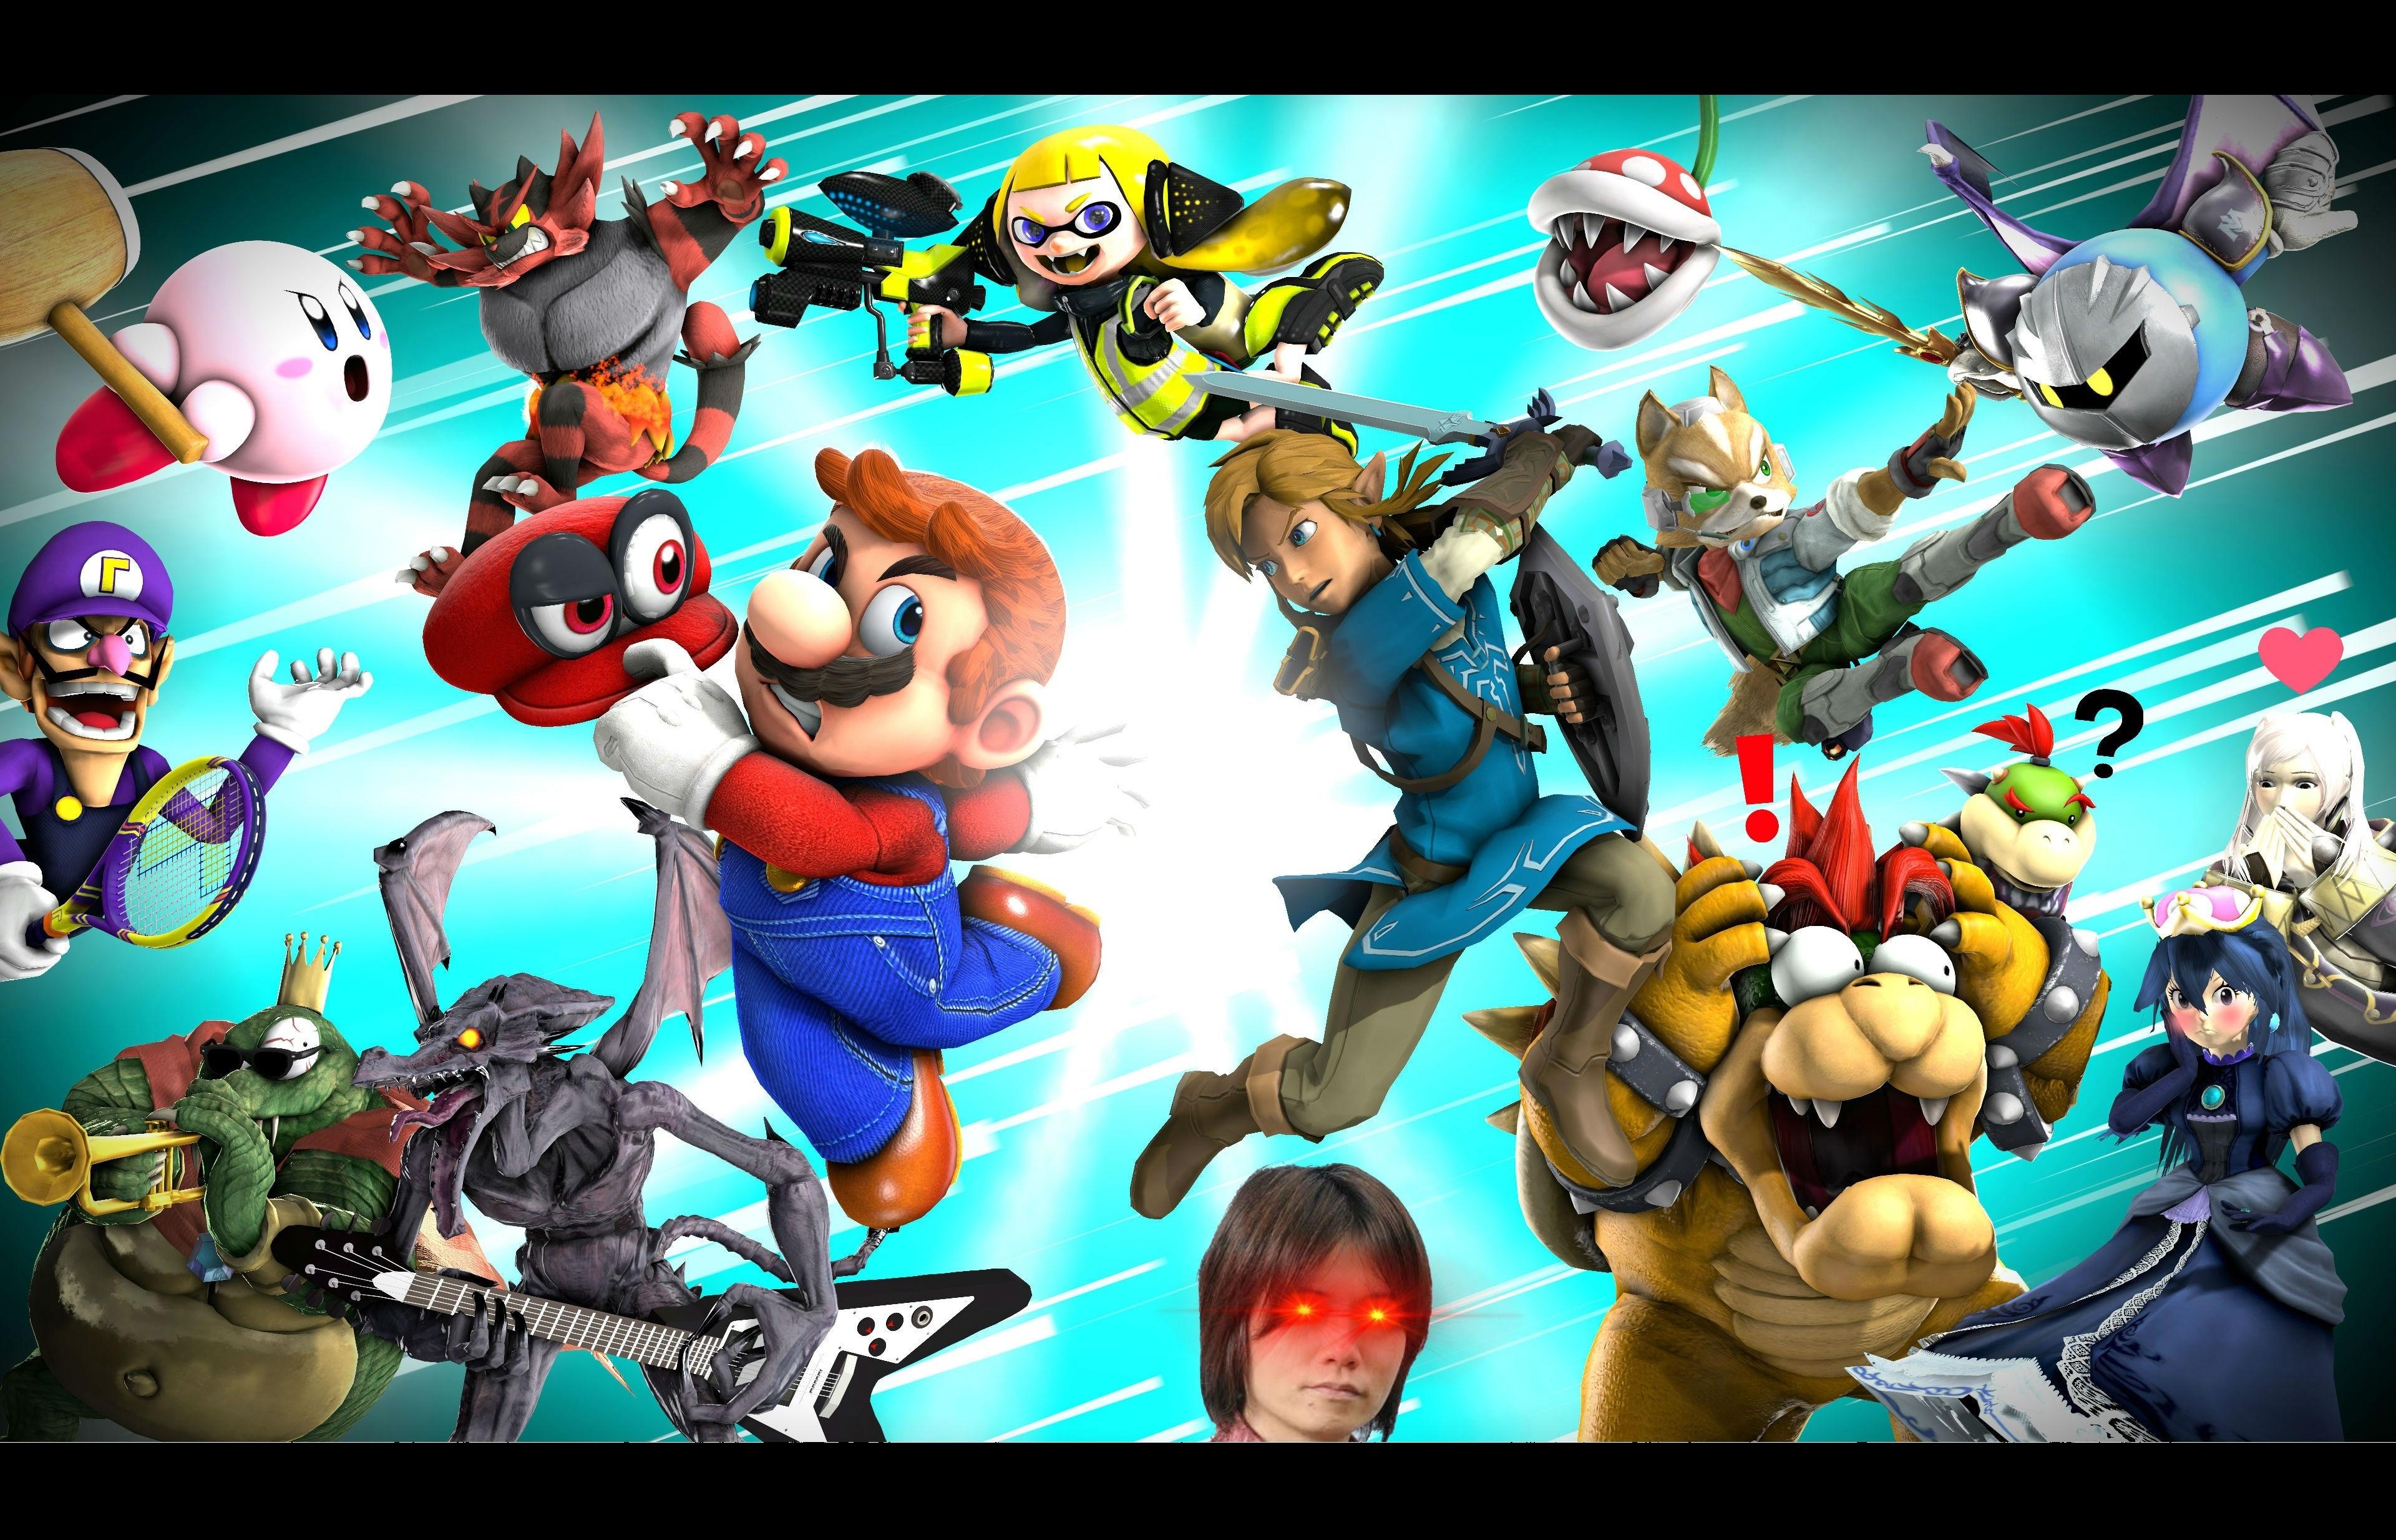 (SFM) Super Smash Bros: The ULTIMATE Parody!